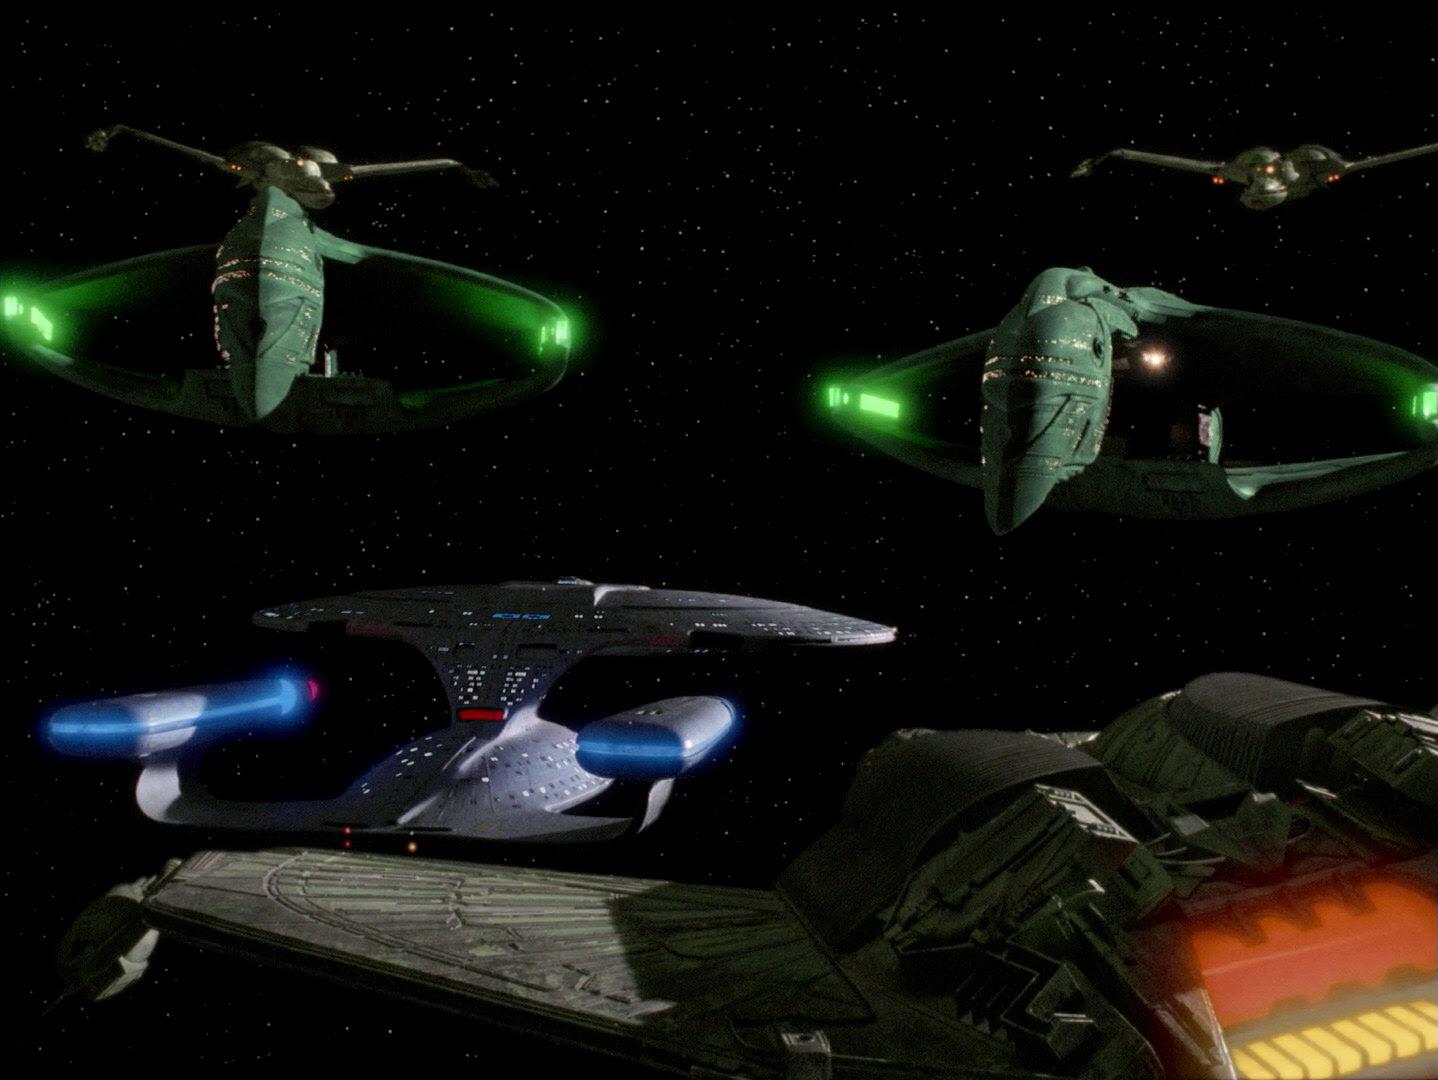 Ex Astris Scientia Starship Gallery Klingon Bird Of Prey